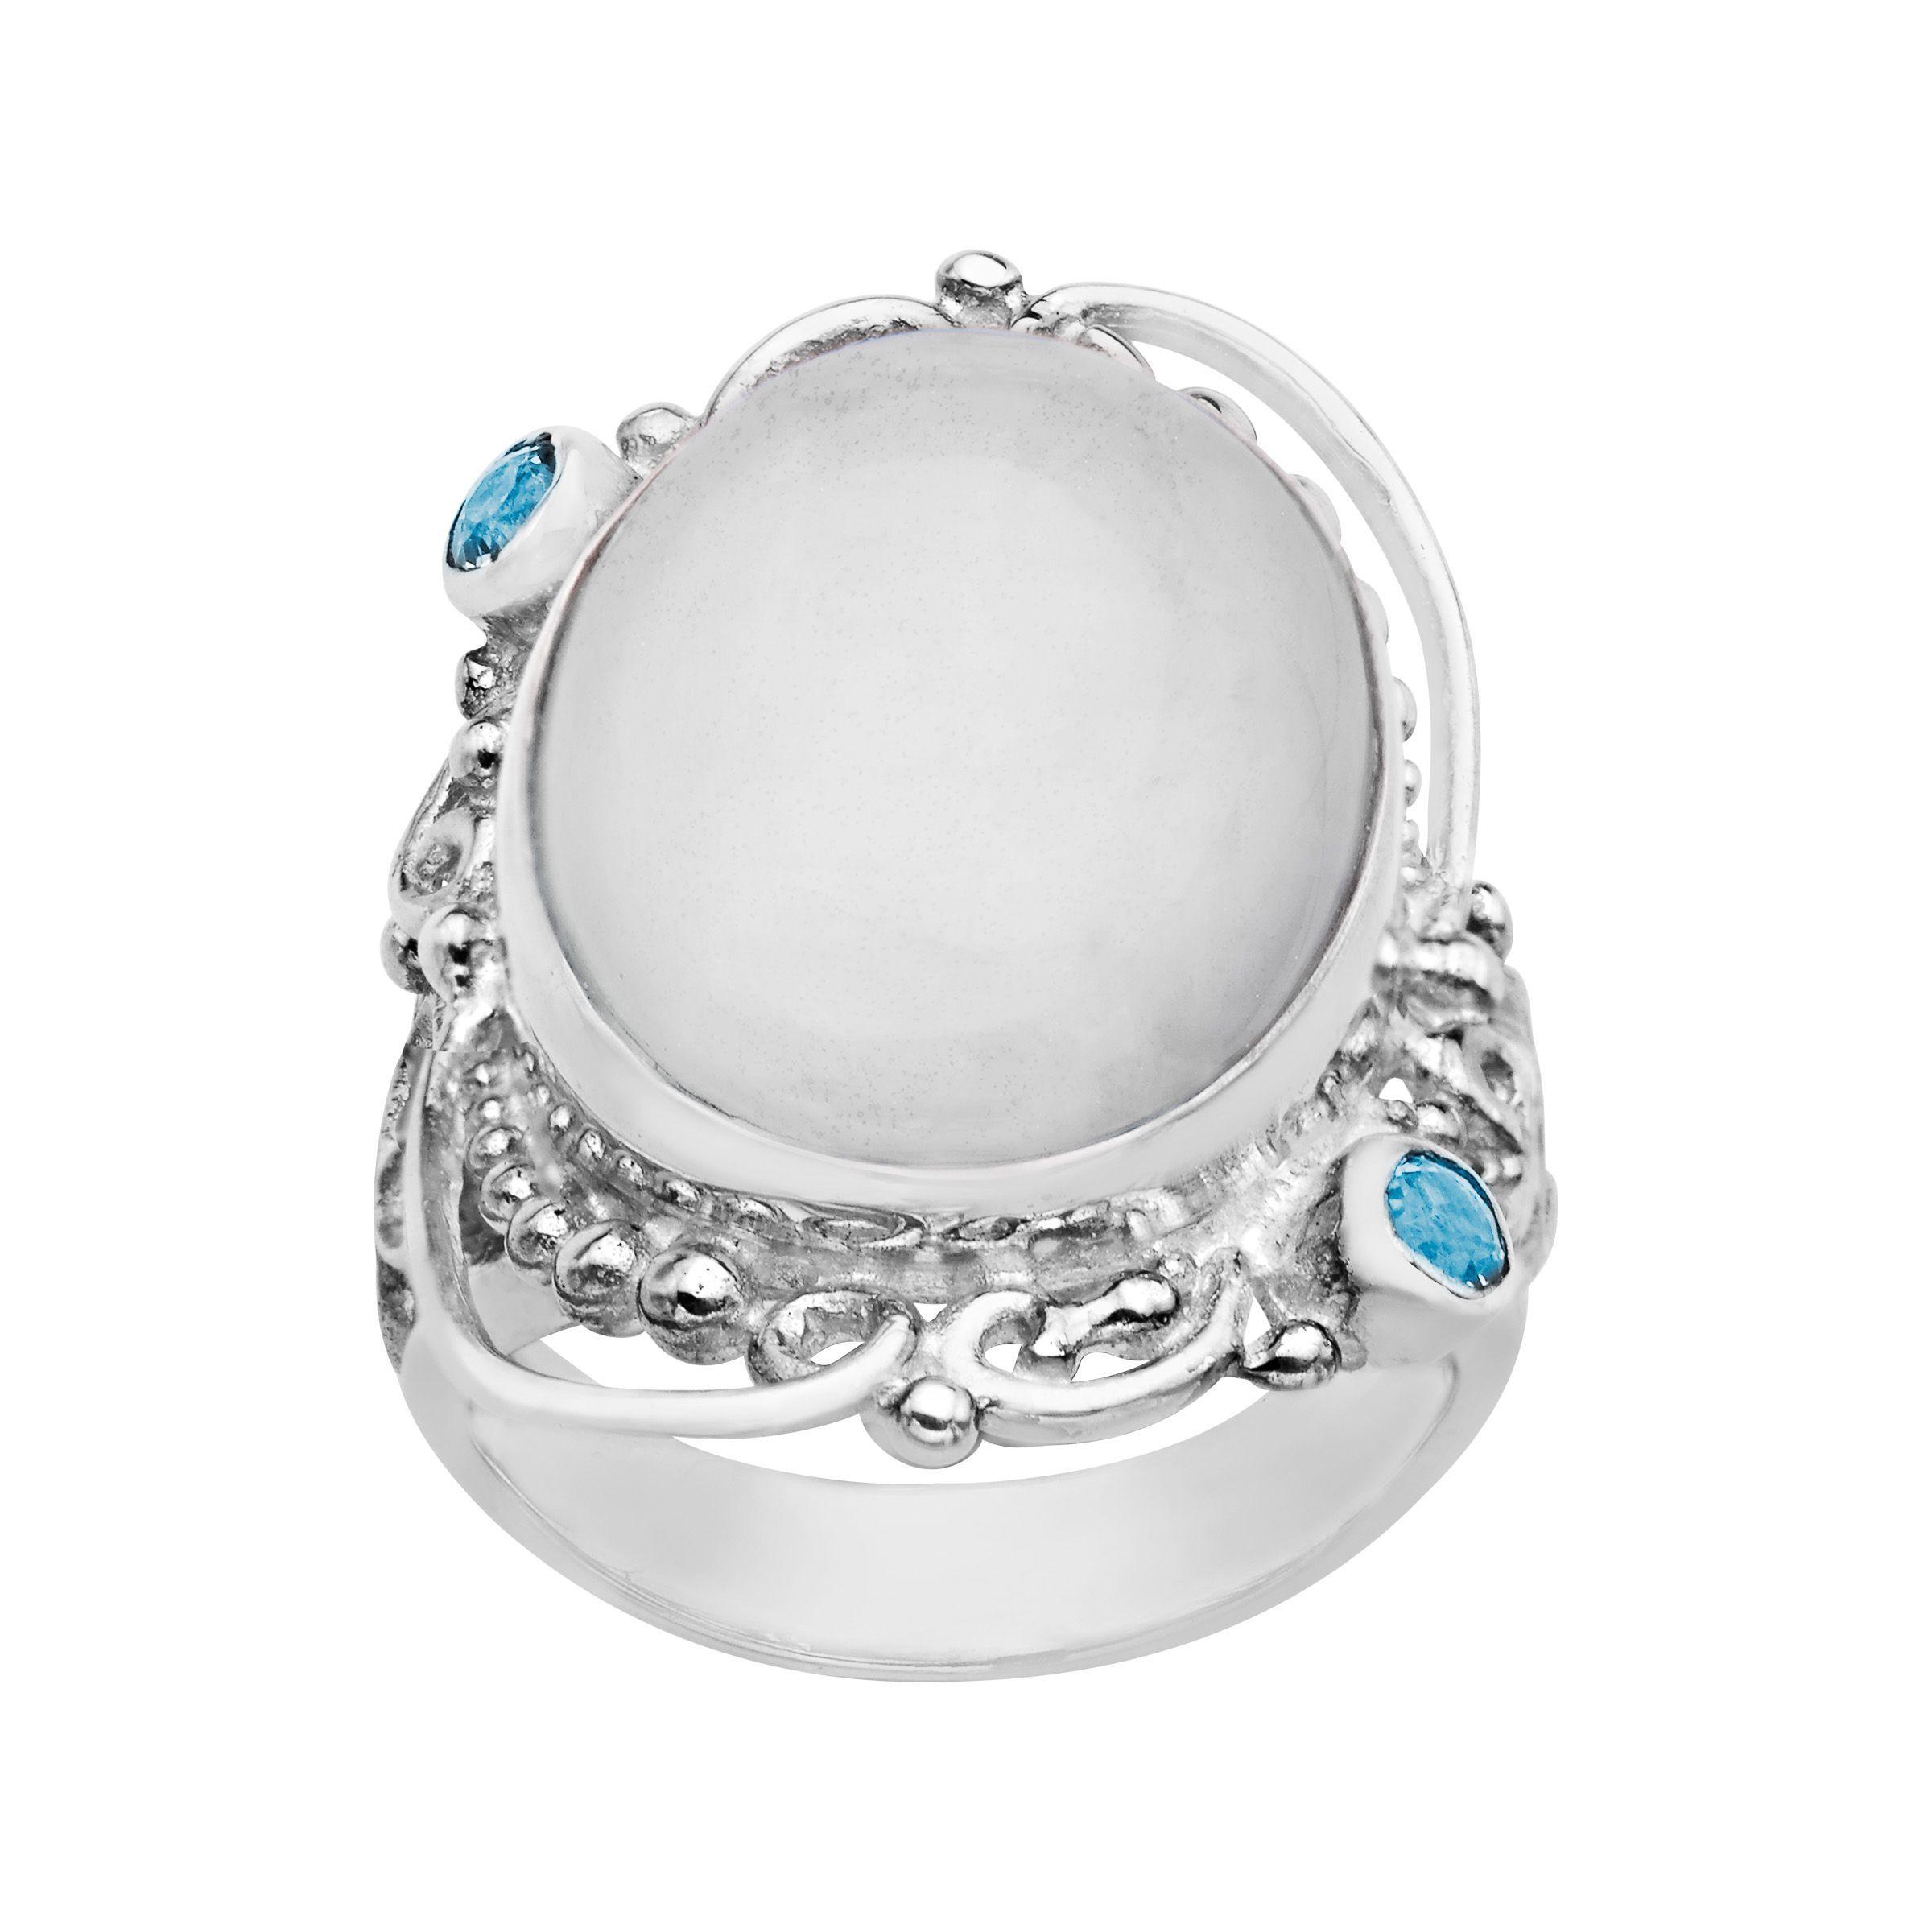 sajen white selenite blue topaz ring in sterling silver. Black Bedroom Furniture Sets. Home Design Ideas